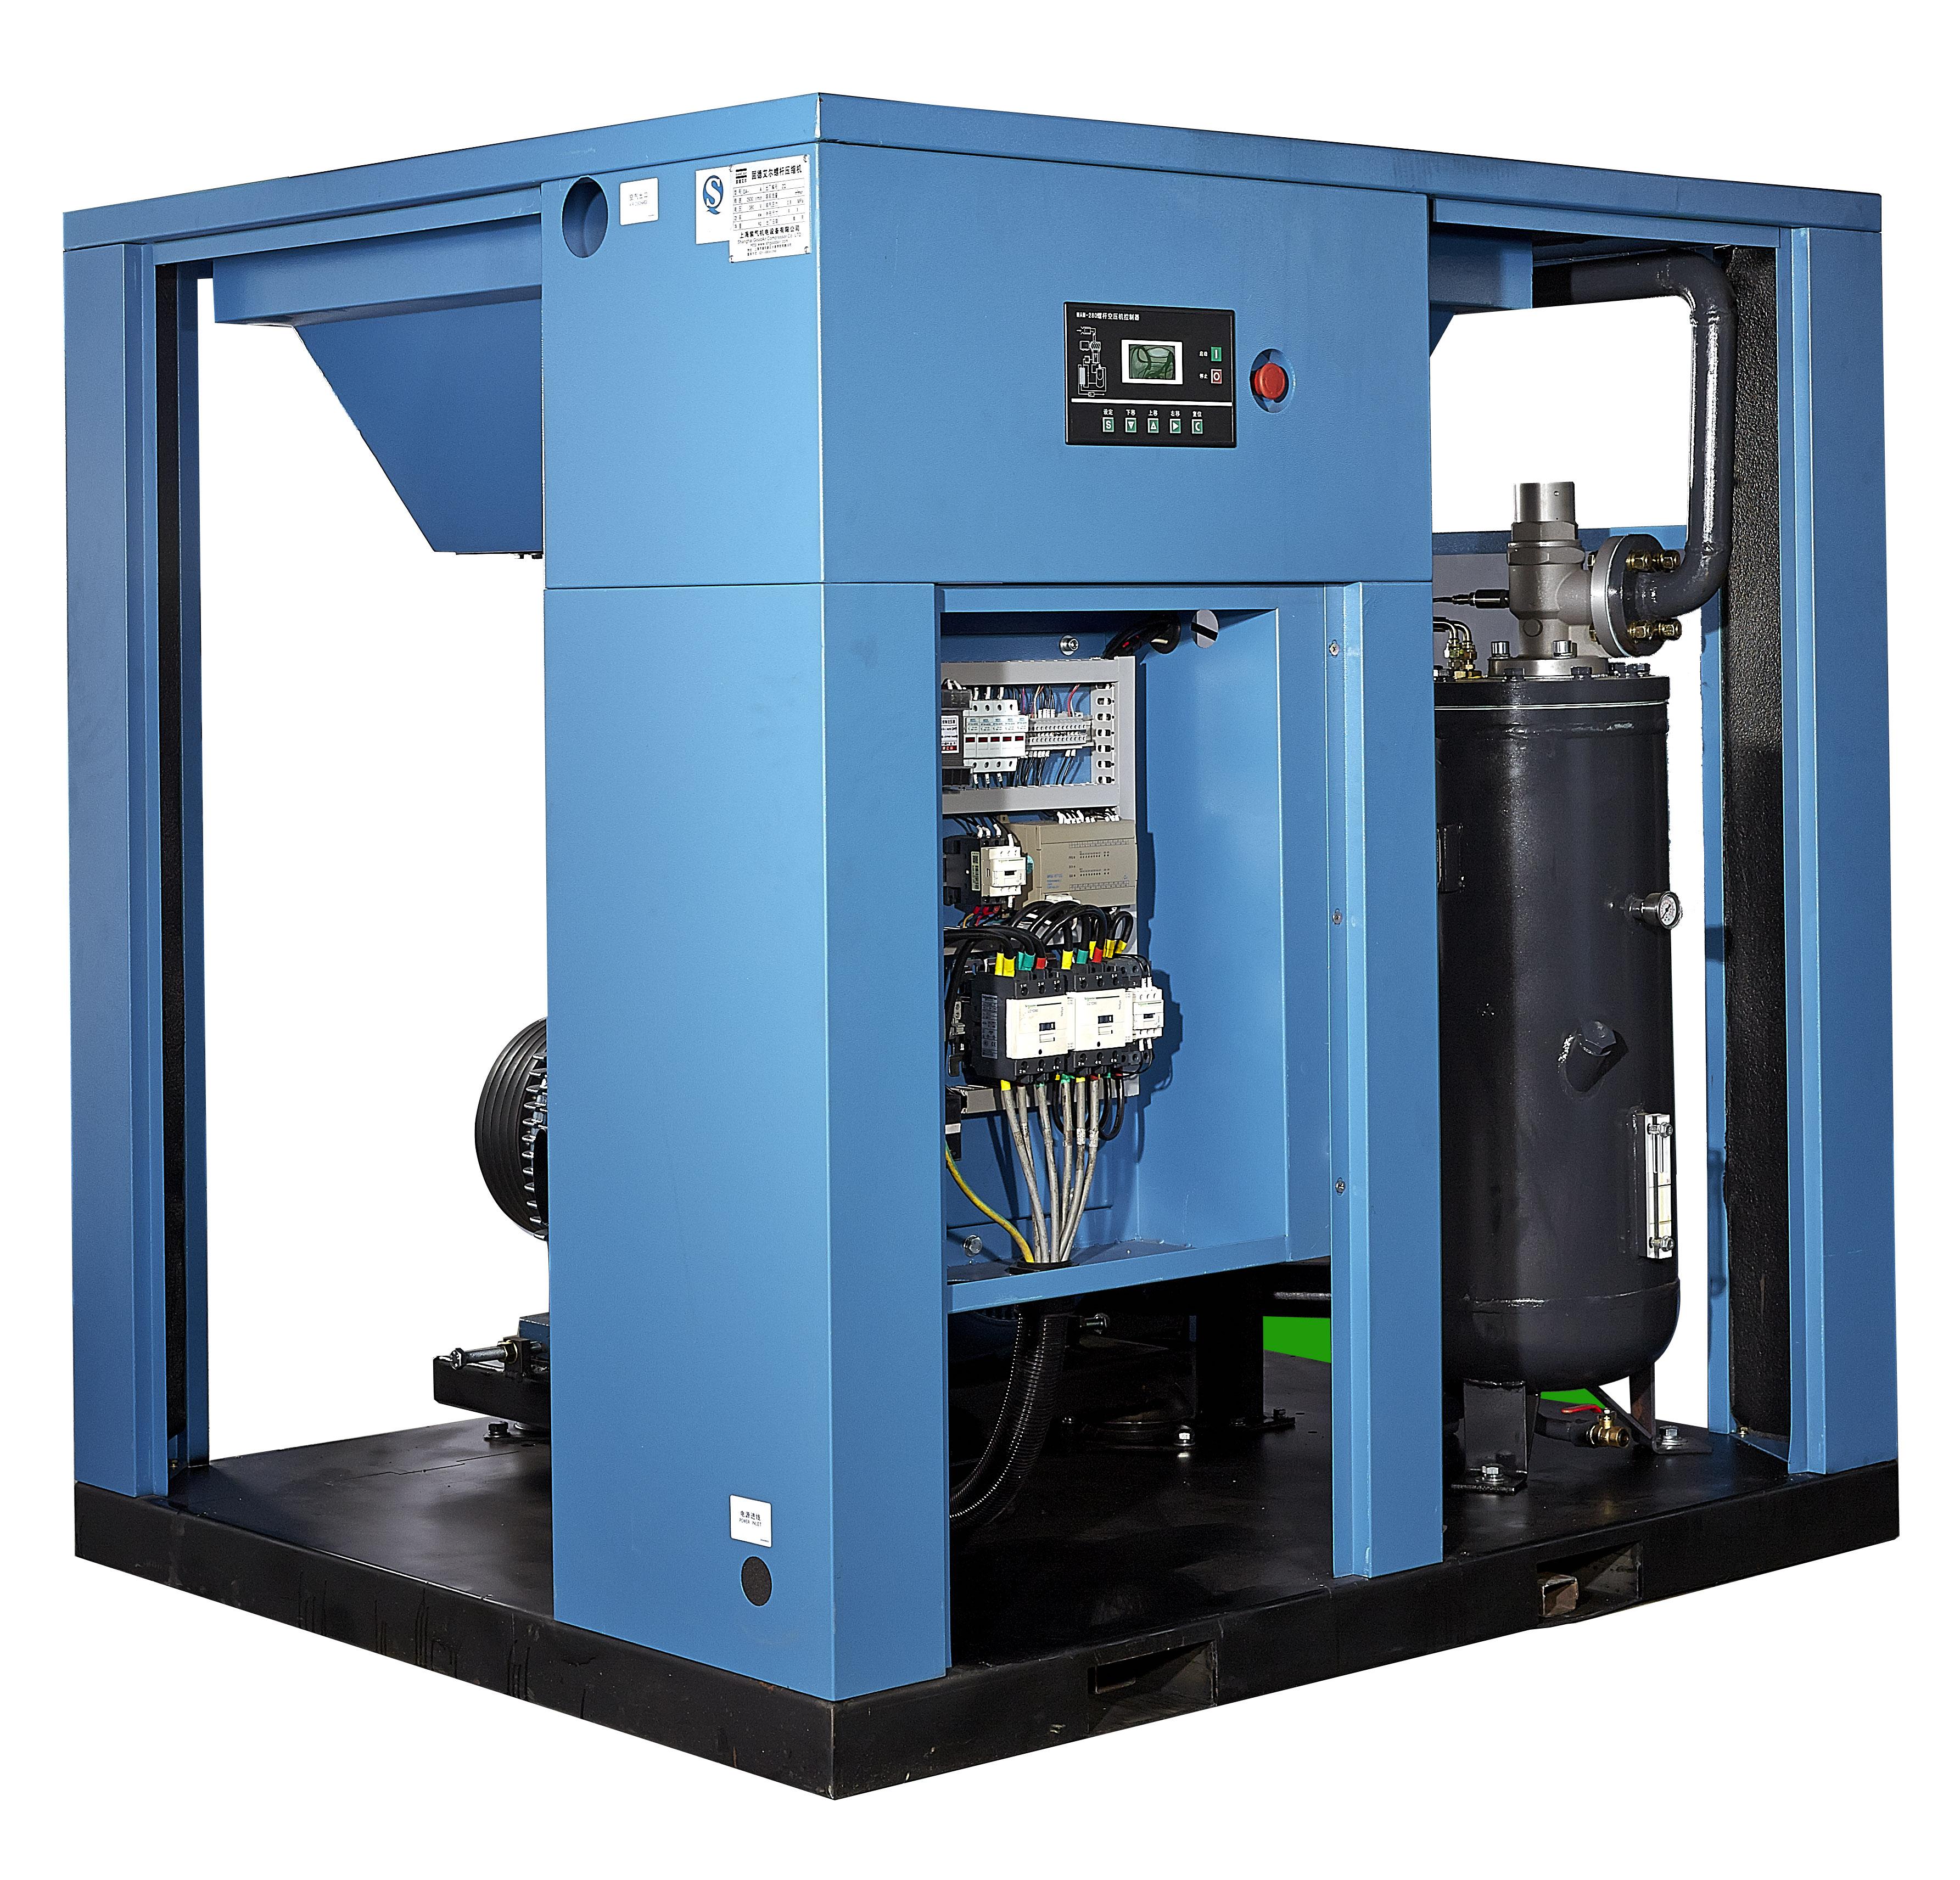 空氣壓縮機安全操作規程 空壓機的安全操作規程